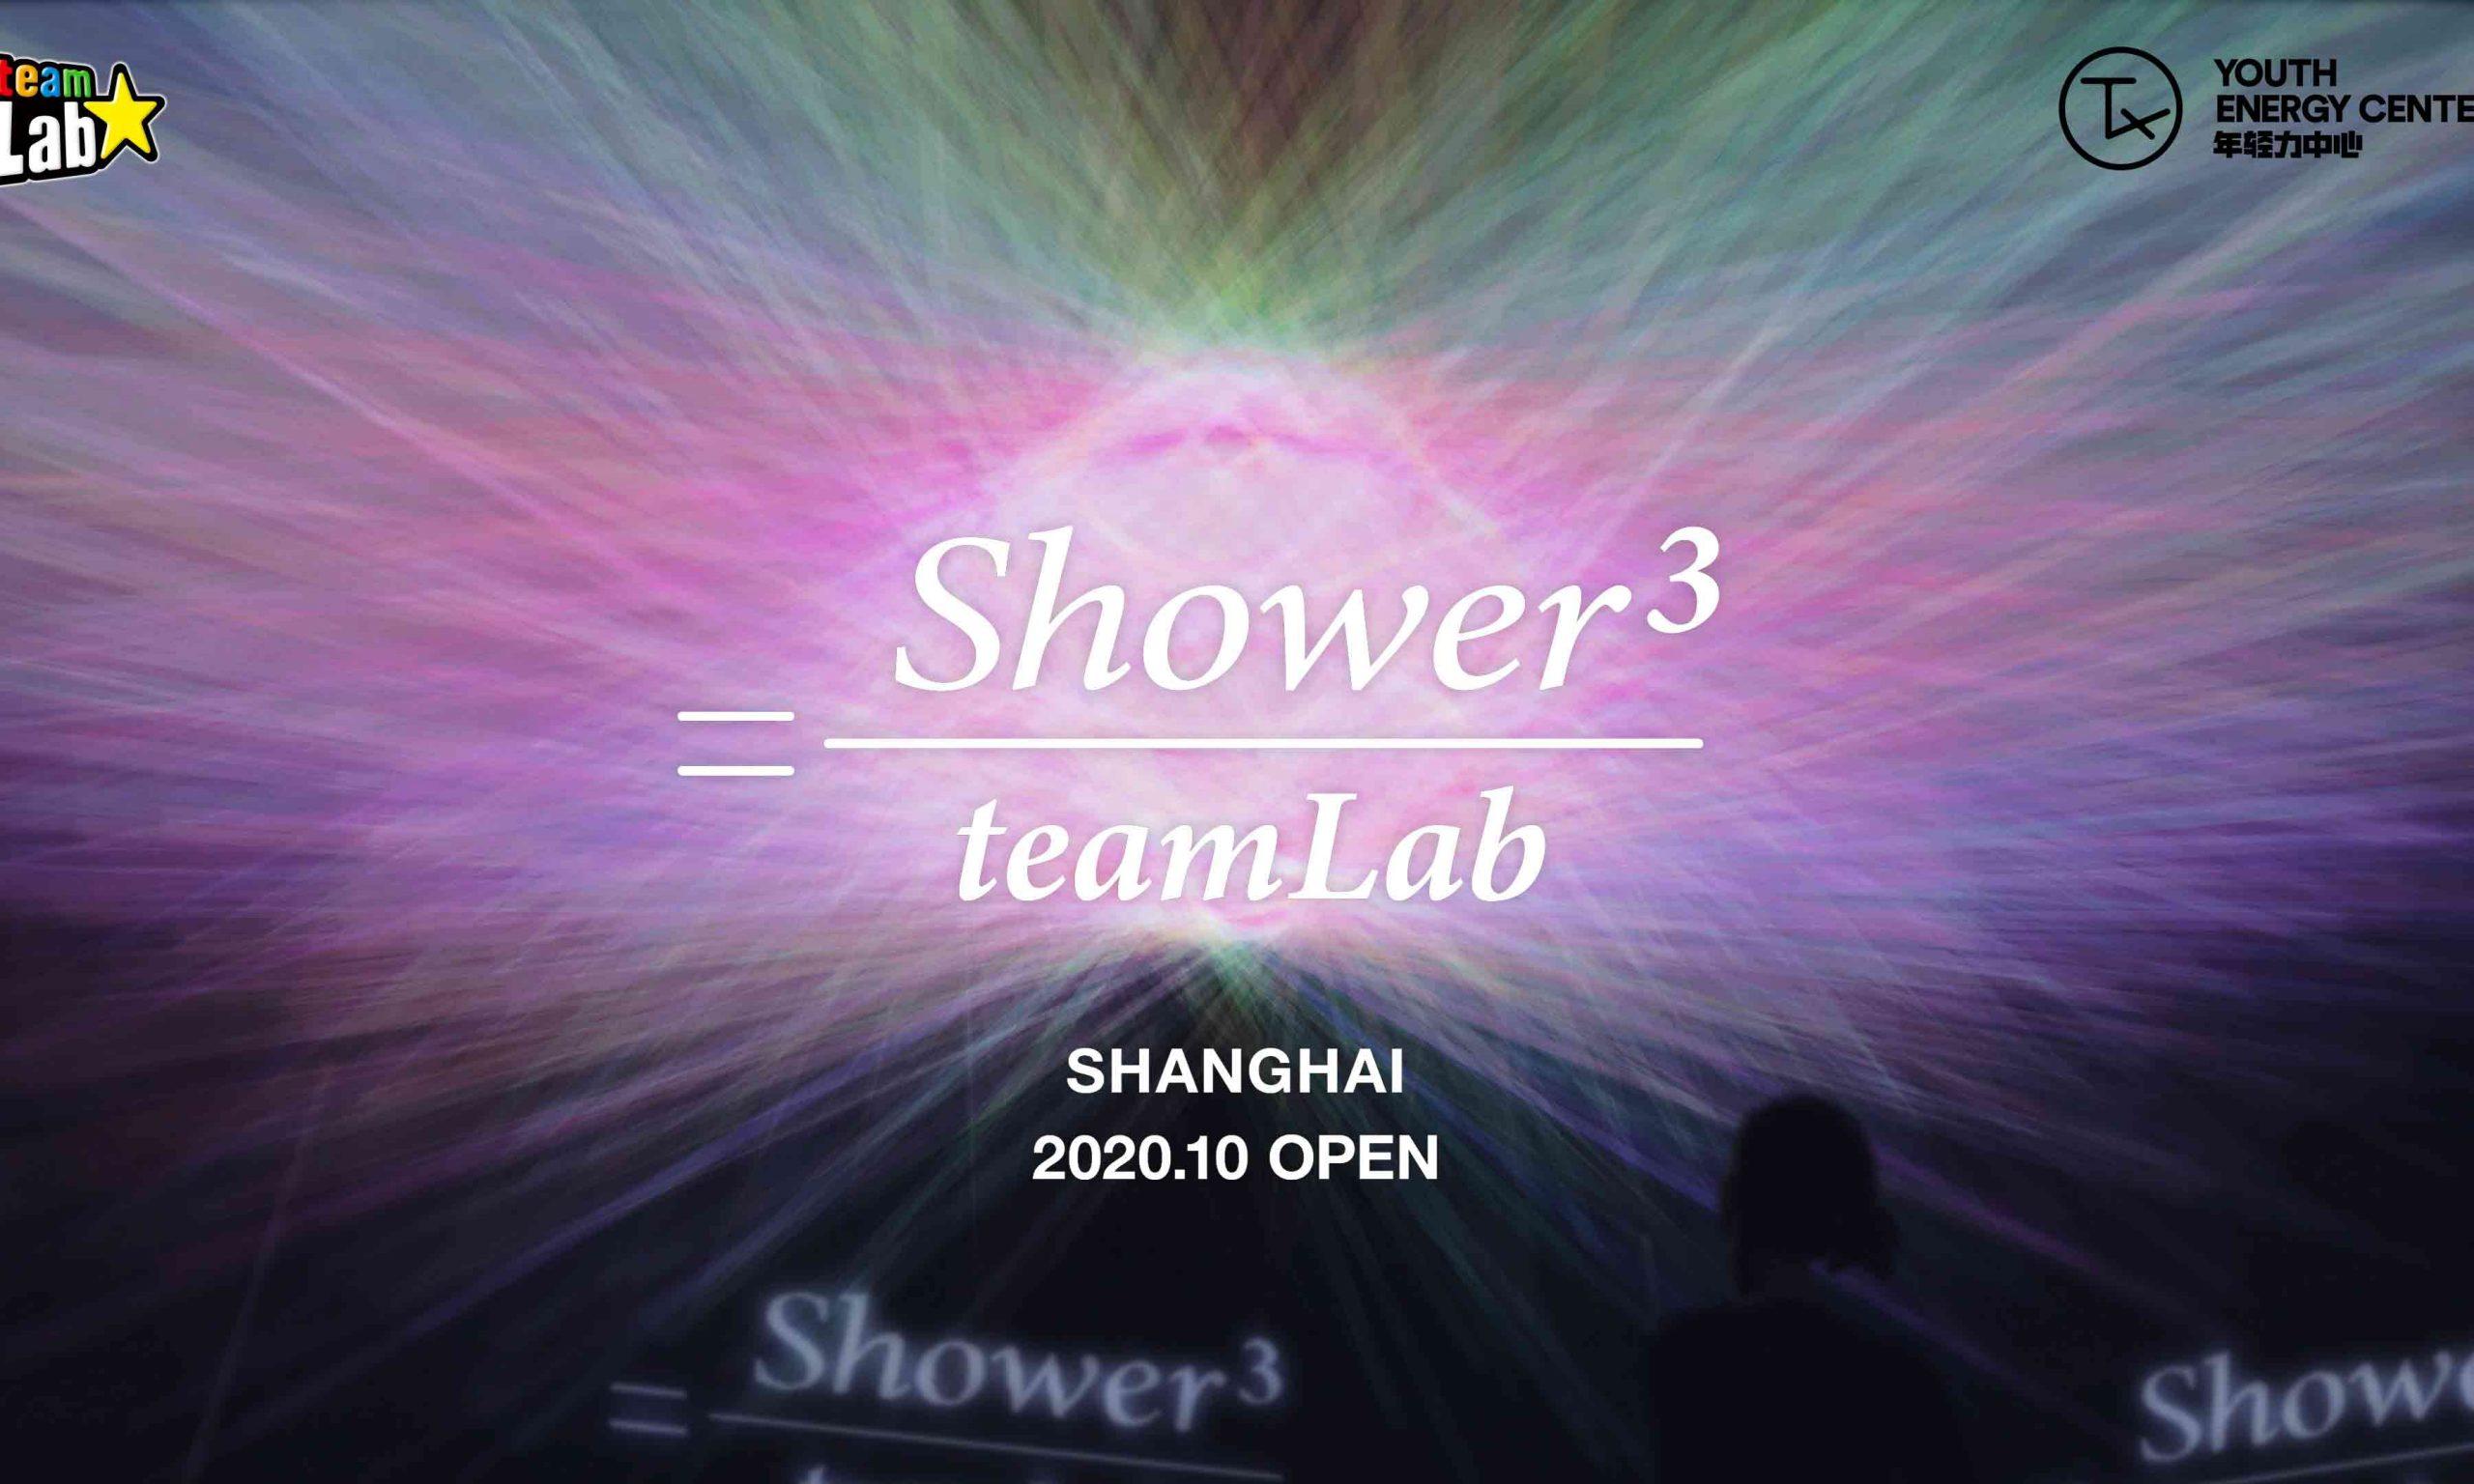 TX 淮海|年轻力中心 10 月底开幕,「Shower³ by teamLab – 上海」永久性光之雕塑空间即将揭幕